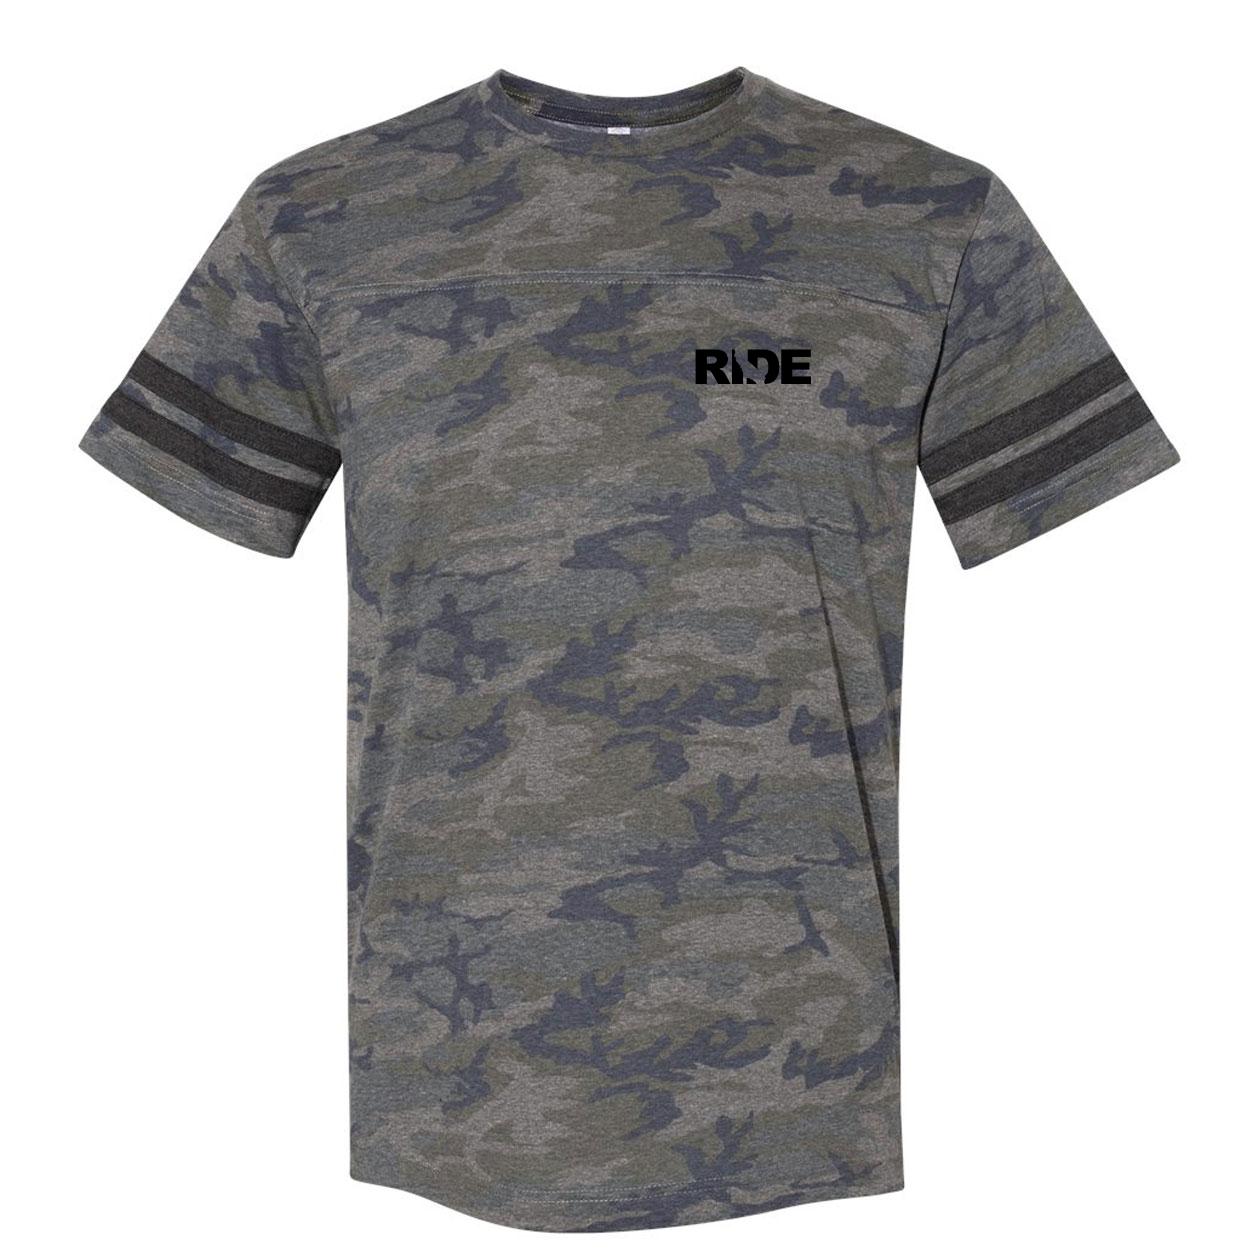 Ride California Night Out Unisex Premium LAT Jersey T-Shirt Vintage Camo/Vintage Stripes (Black Logo)